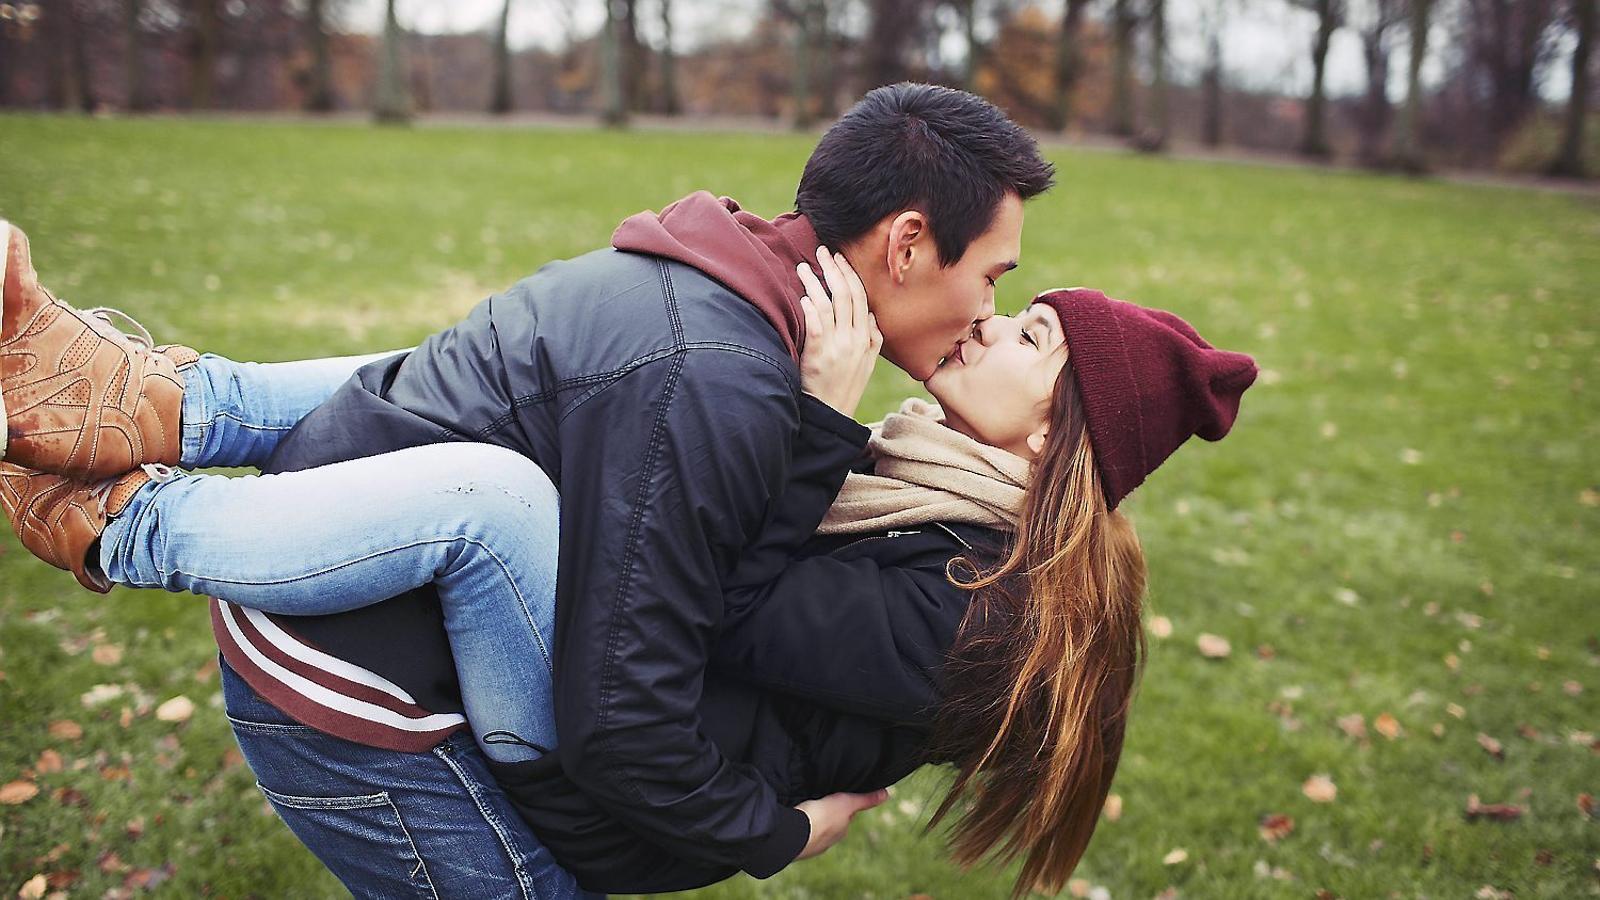 sexe amour adolescents sexe